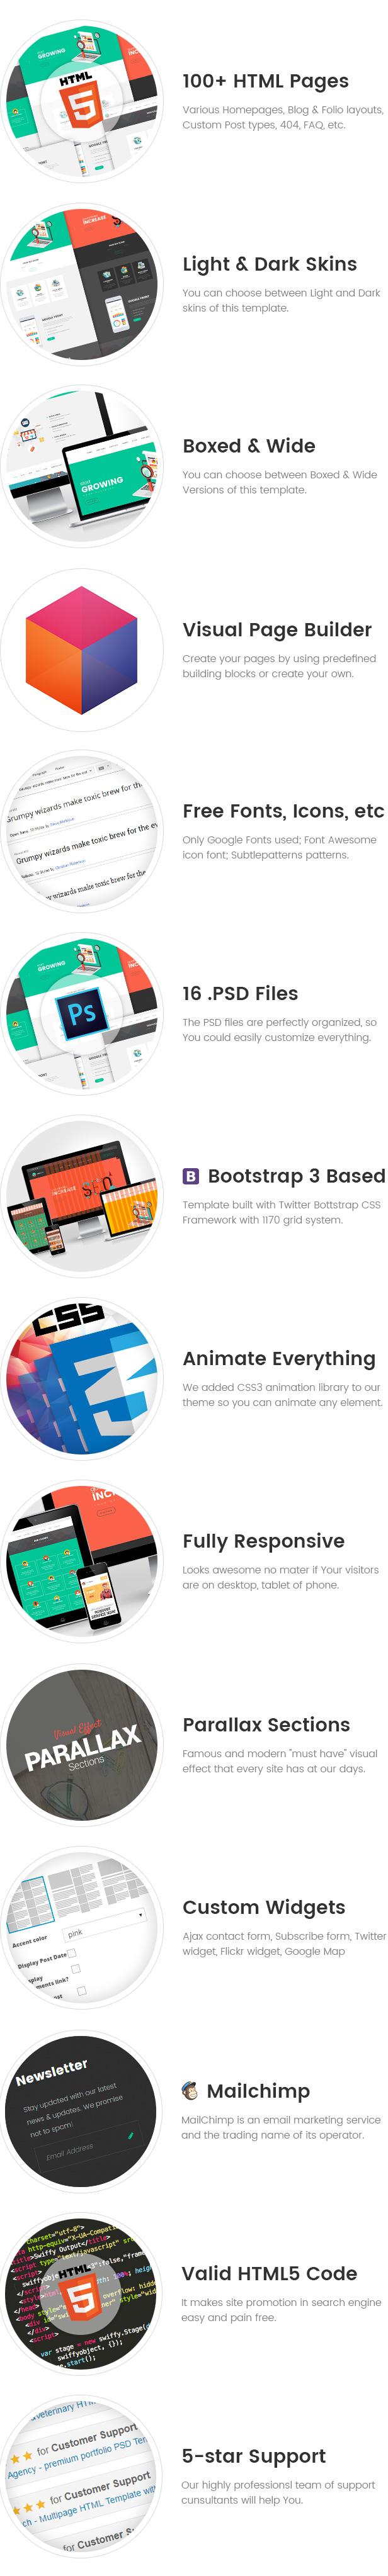 seoboost_html_description